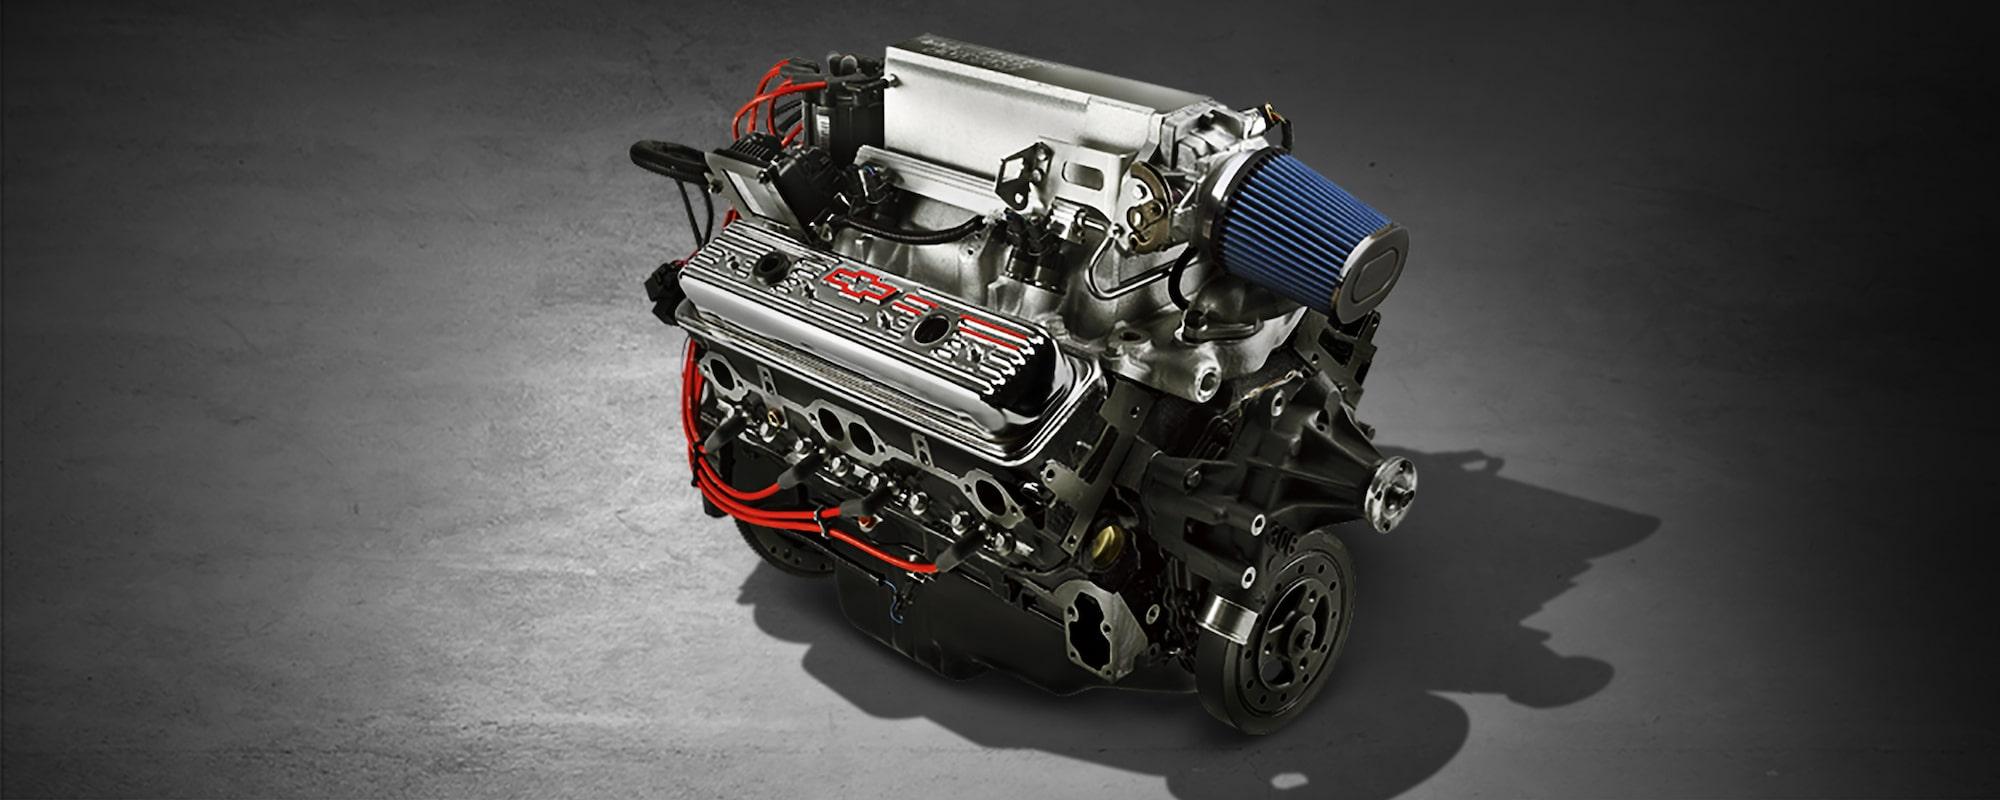 350 Chevy Ramjet Motor Wiring Diagram Diagrams 1989 Alternator Ram Jet Small Block Crate Engine Chevrolet Performance Rh Com